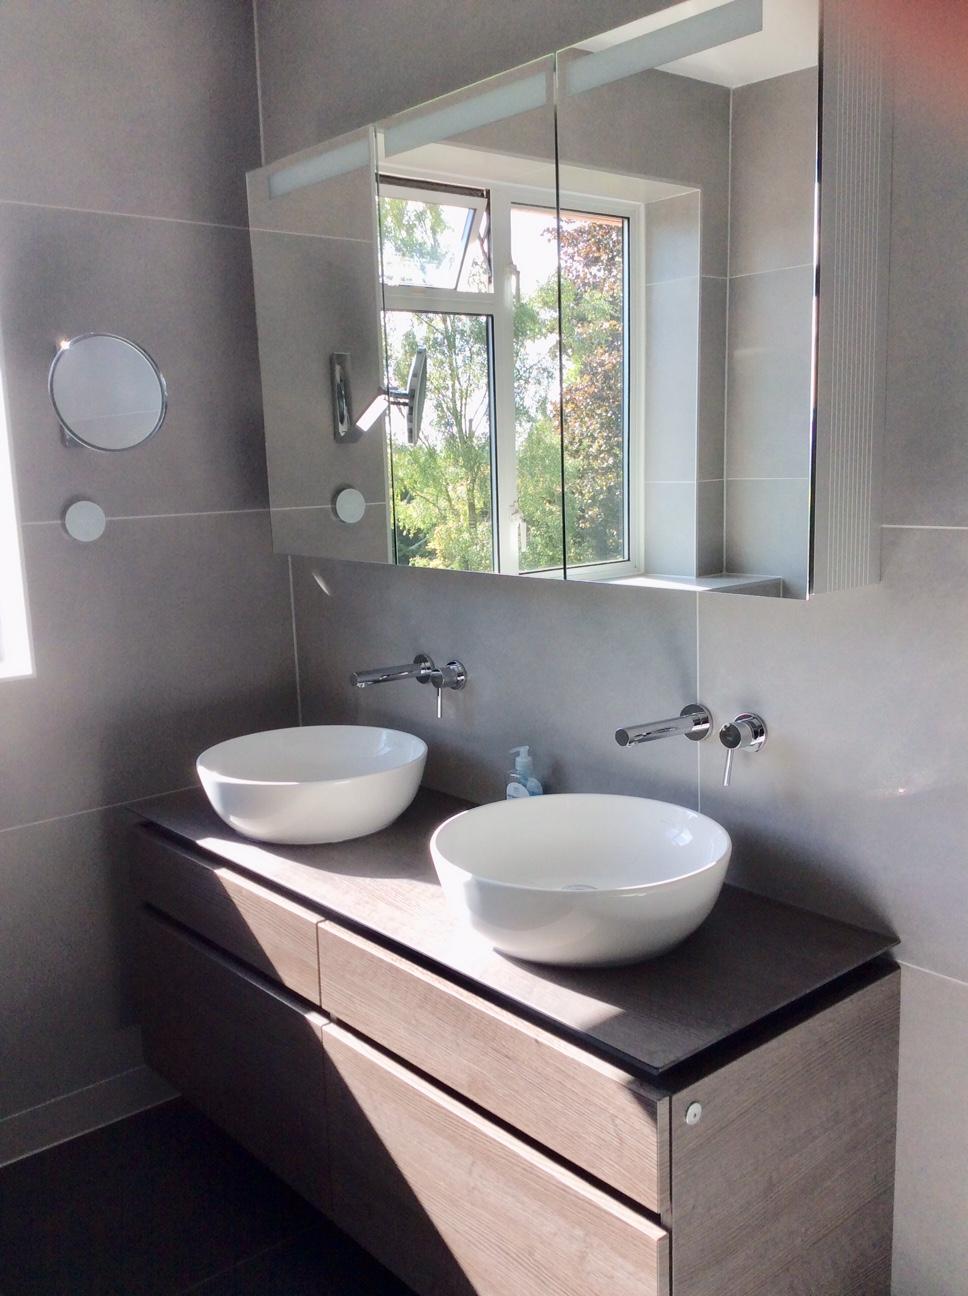 V&B Legato, Aqueous Bathrooms and Kitchens, Princes Risborough, Buckinghamshire